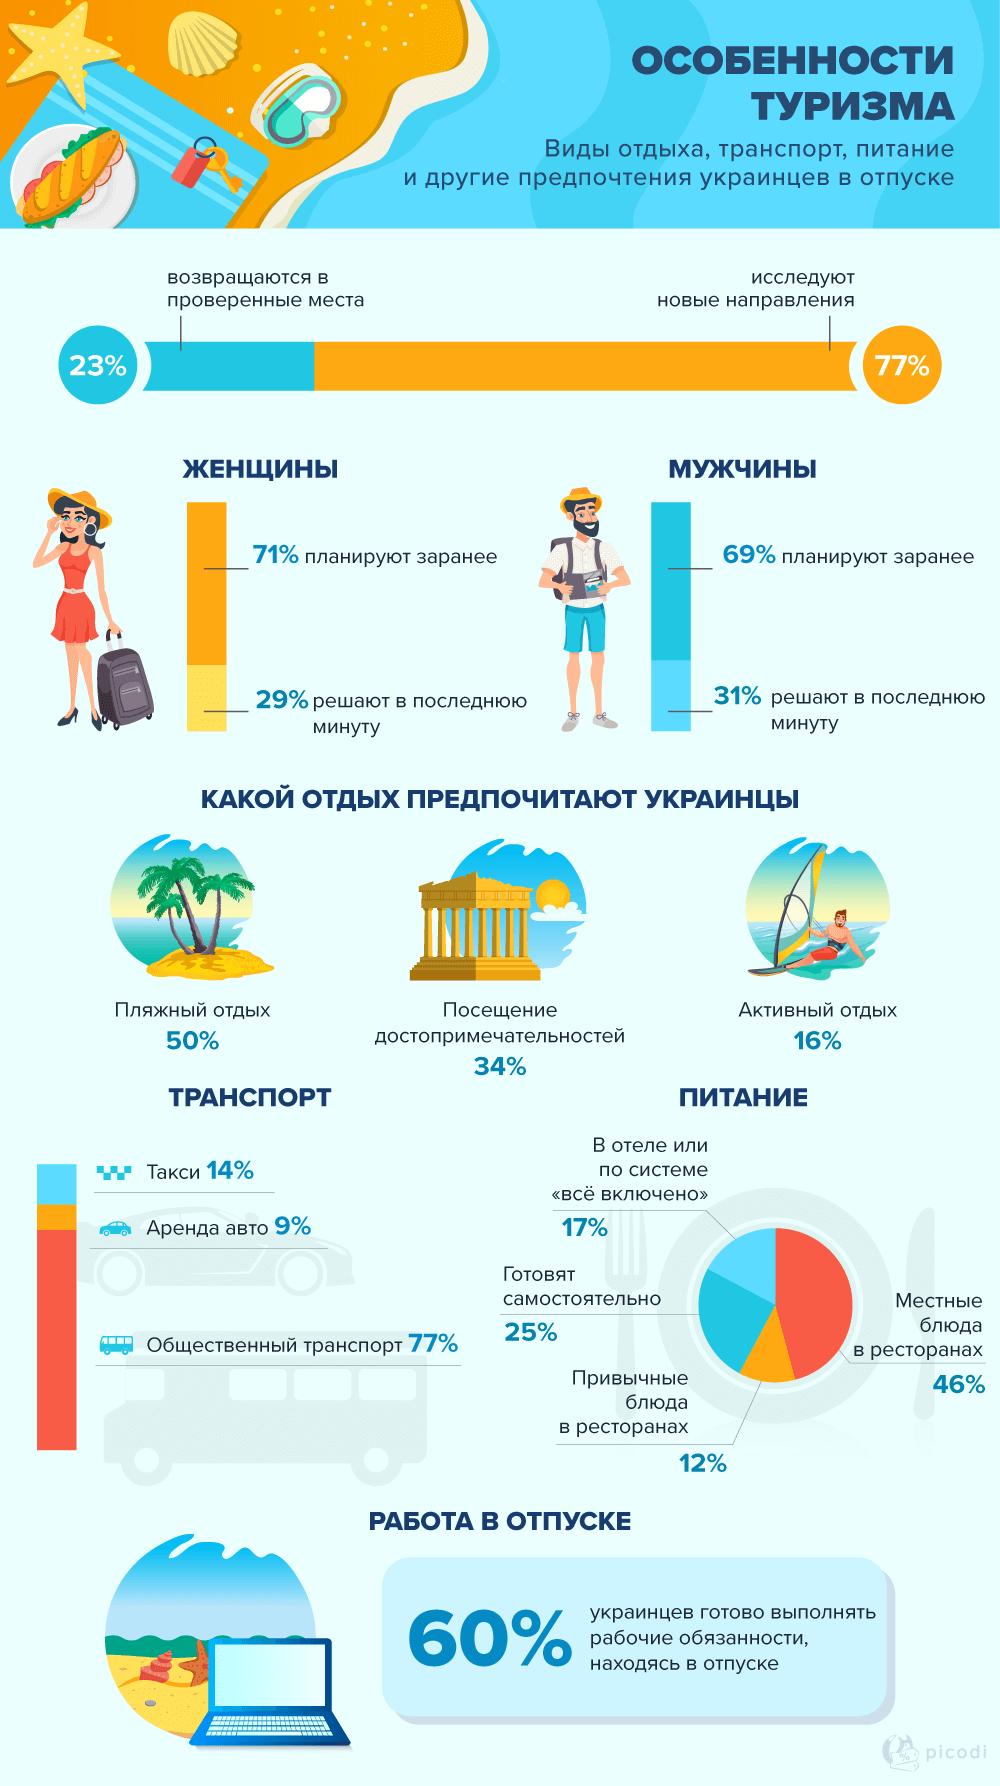 Статистика по Украине 2019: туризм и отдых